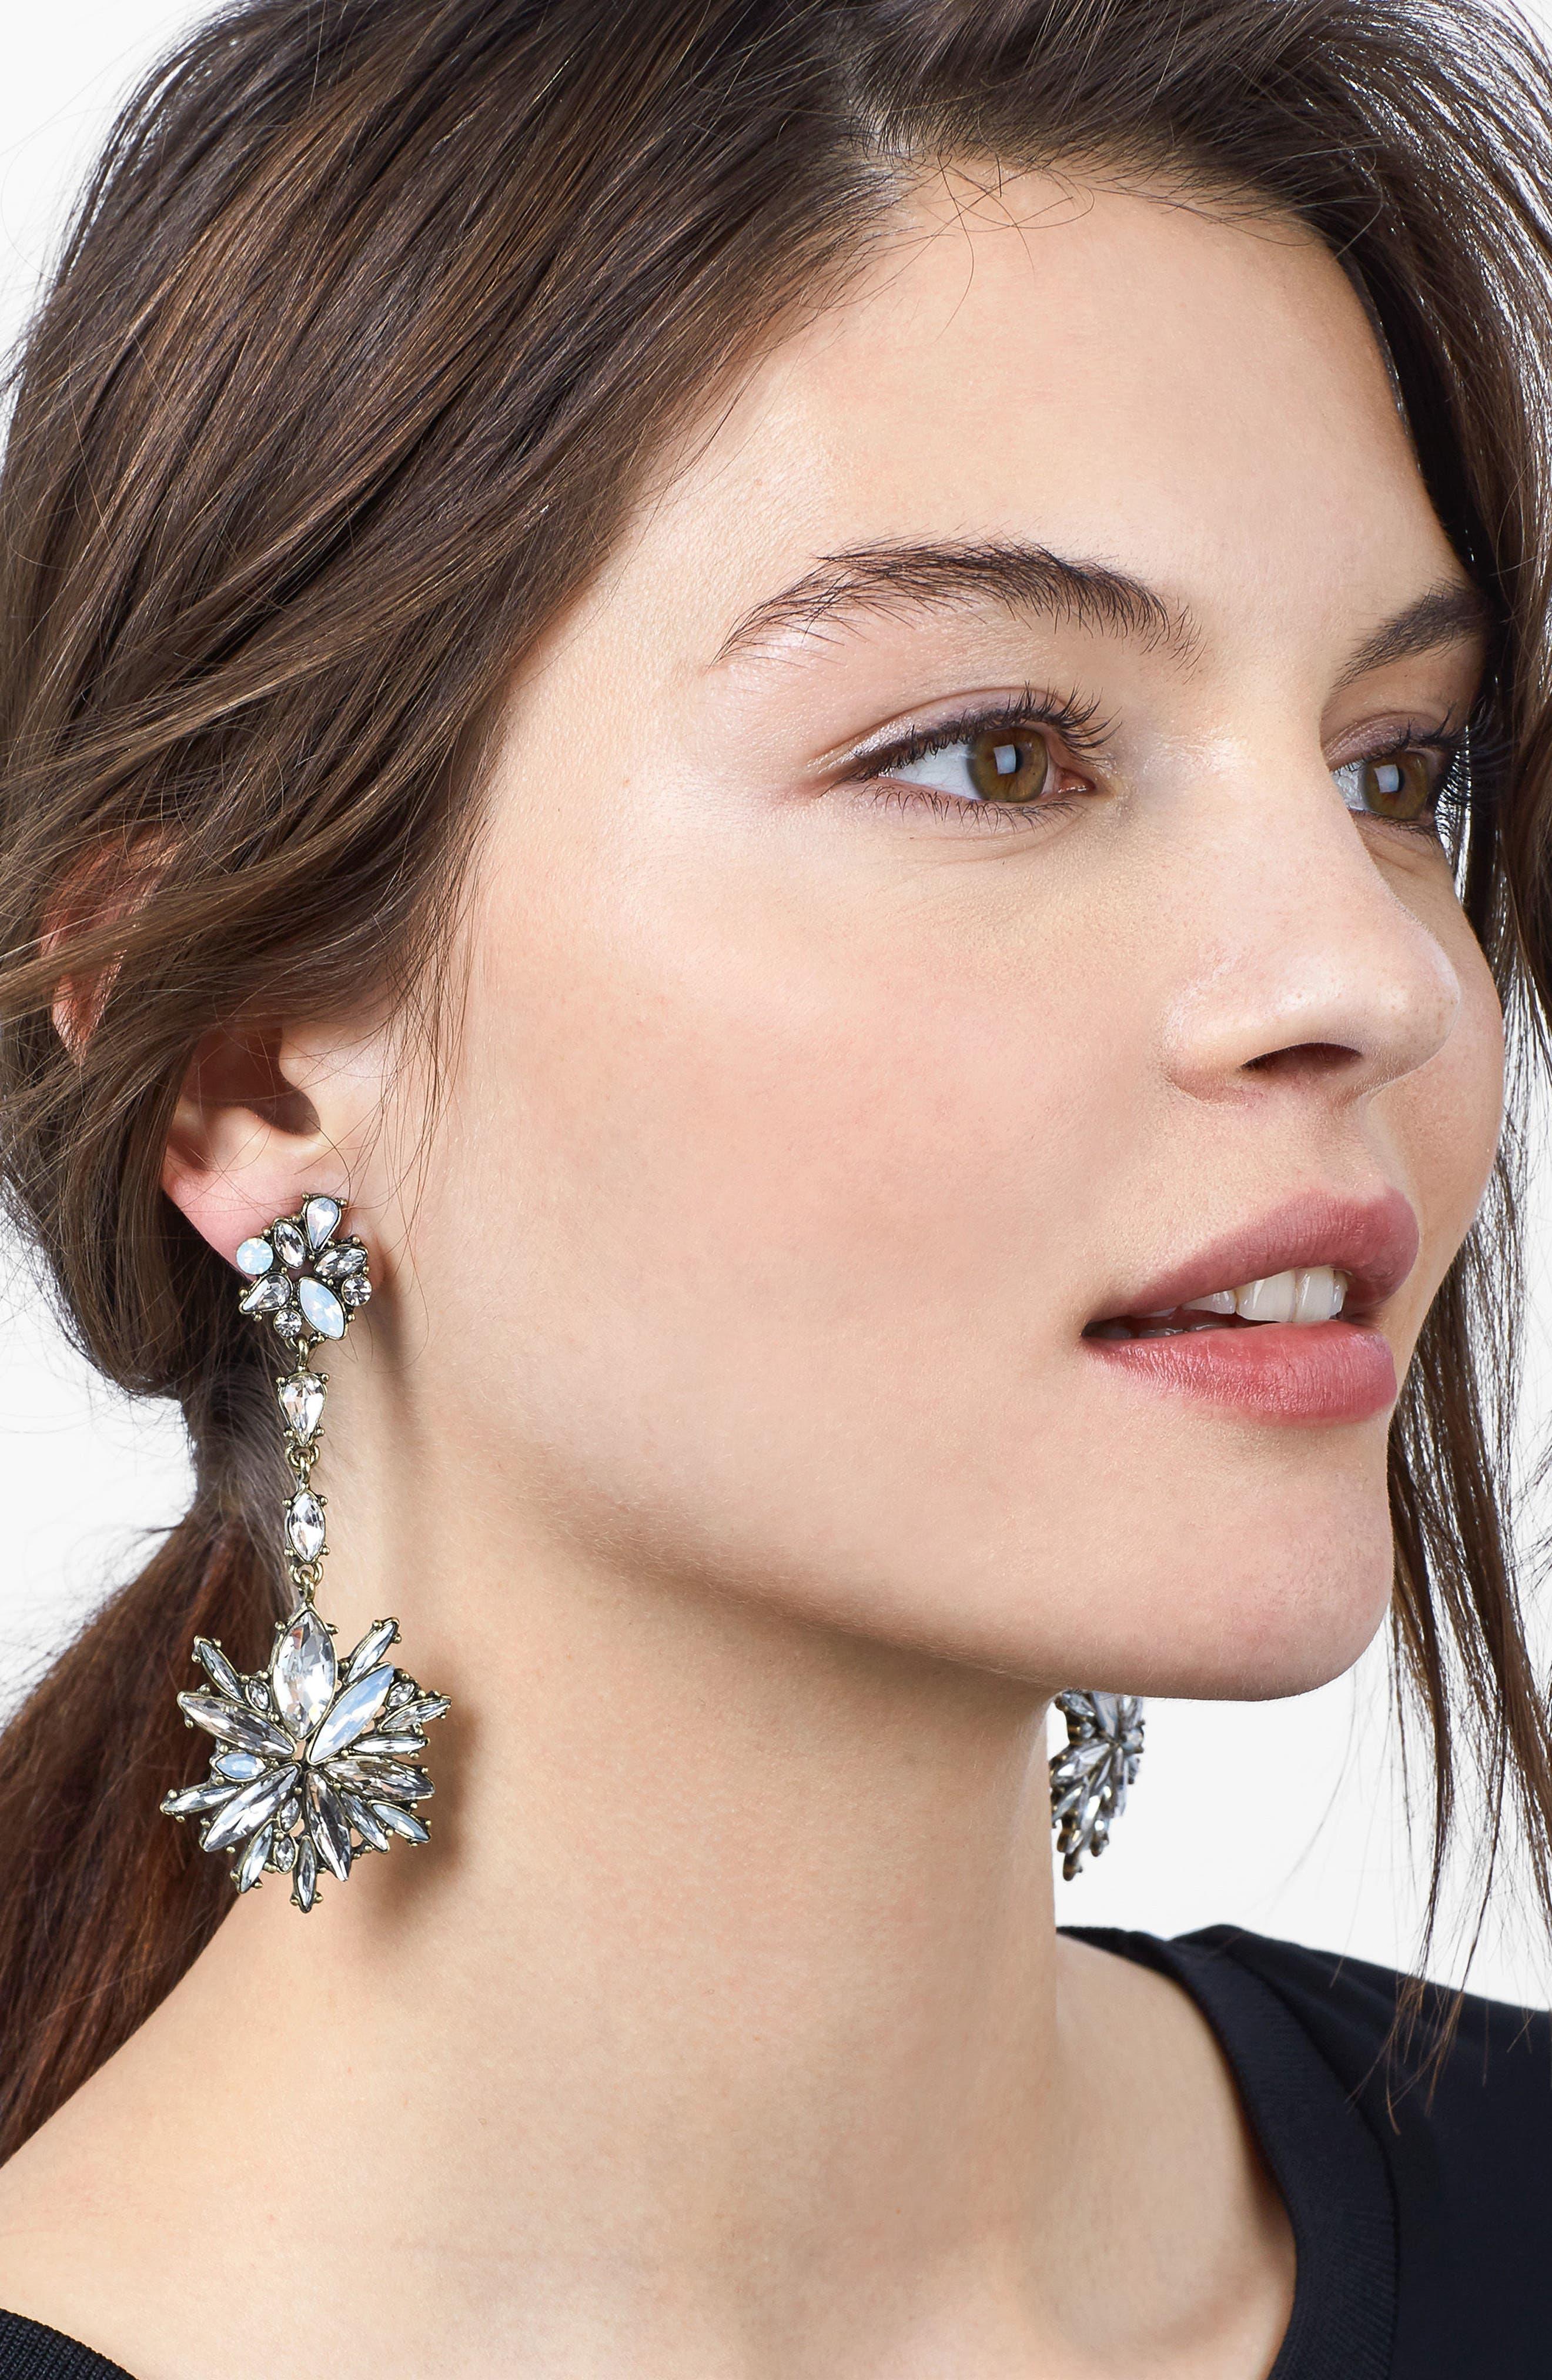 Icicle Drop Earrings,                             Alternate thumbnail 2, color,                             040